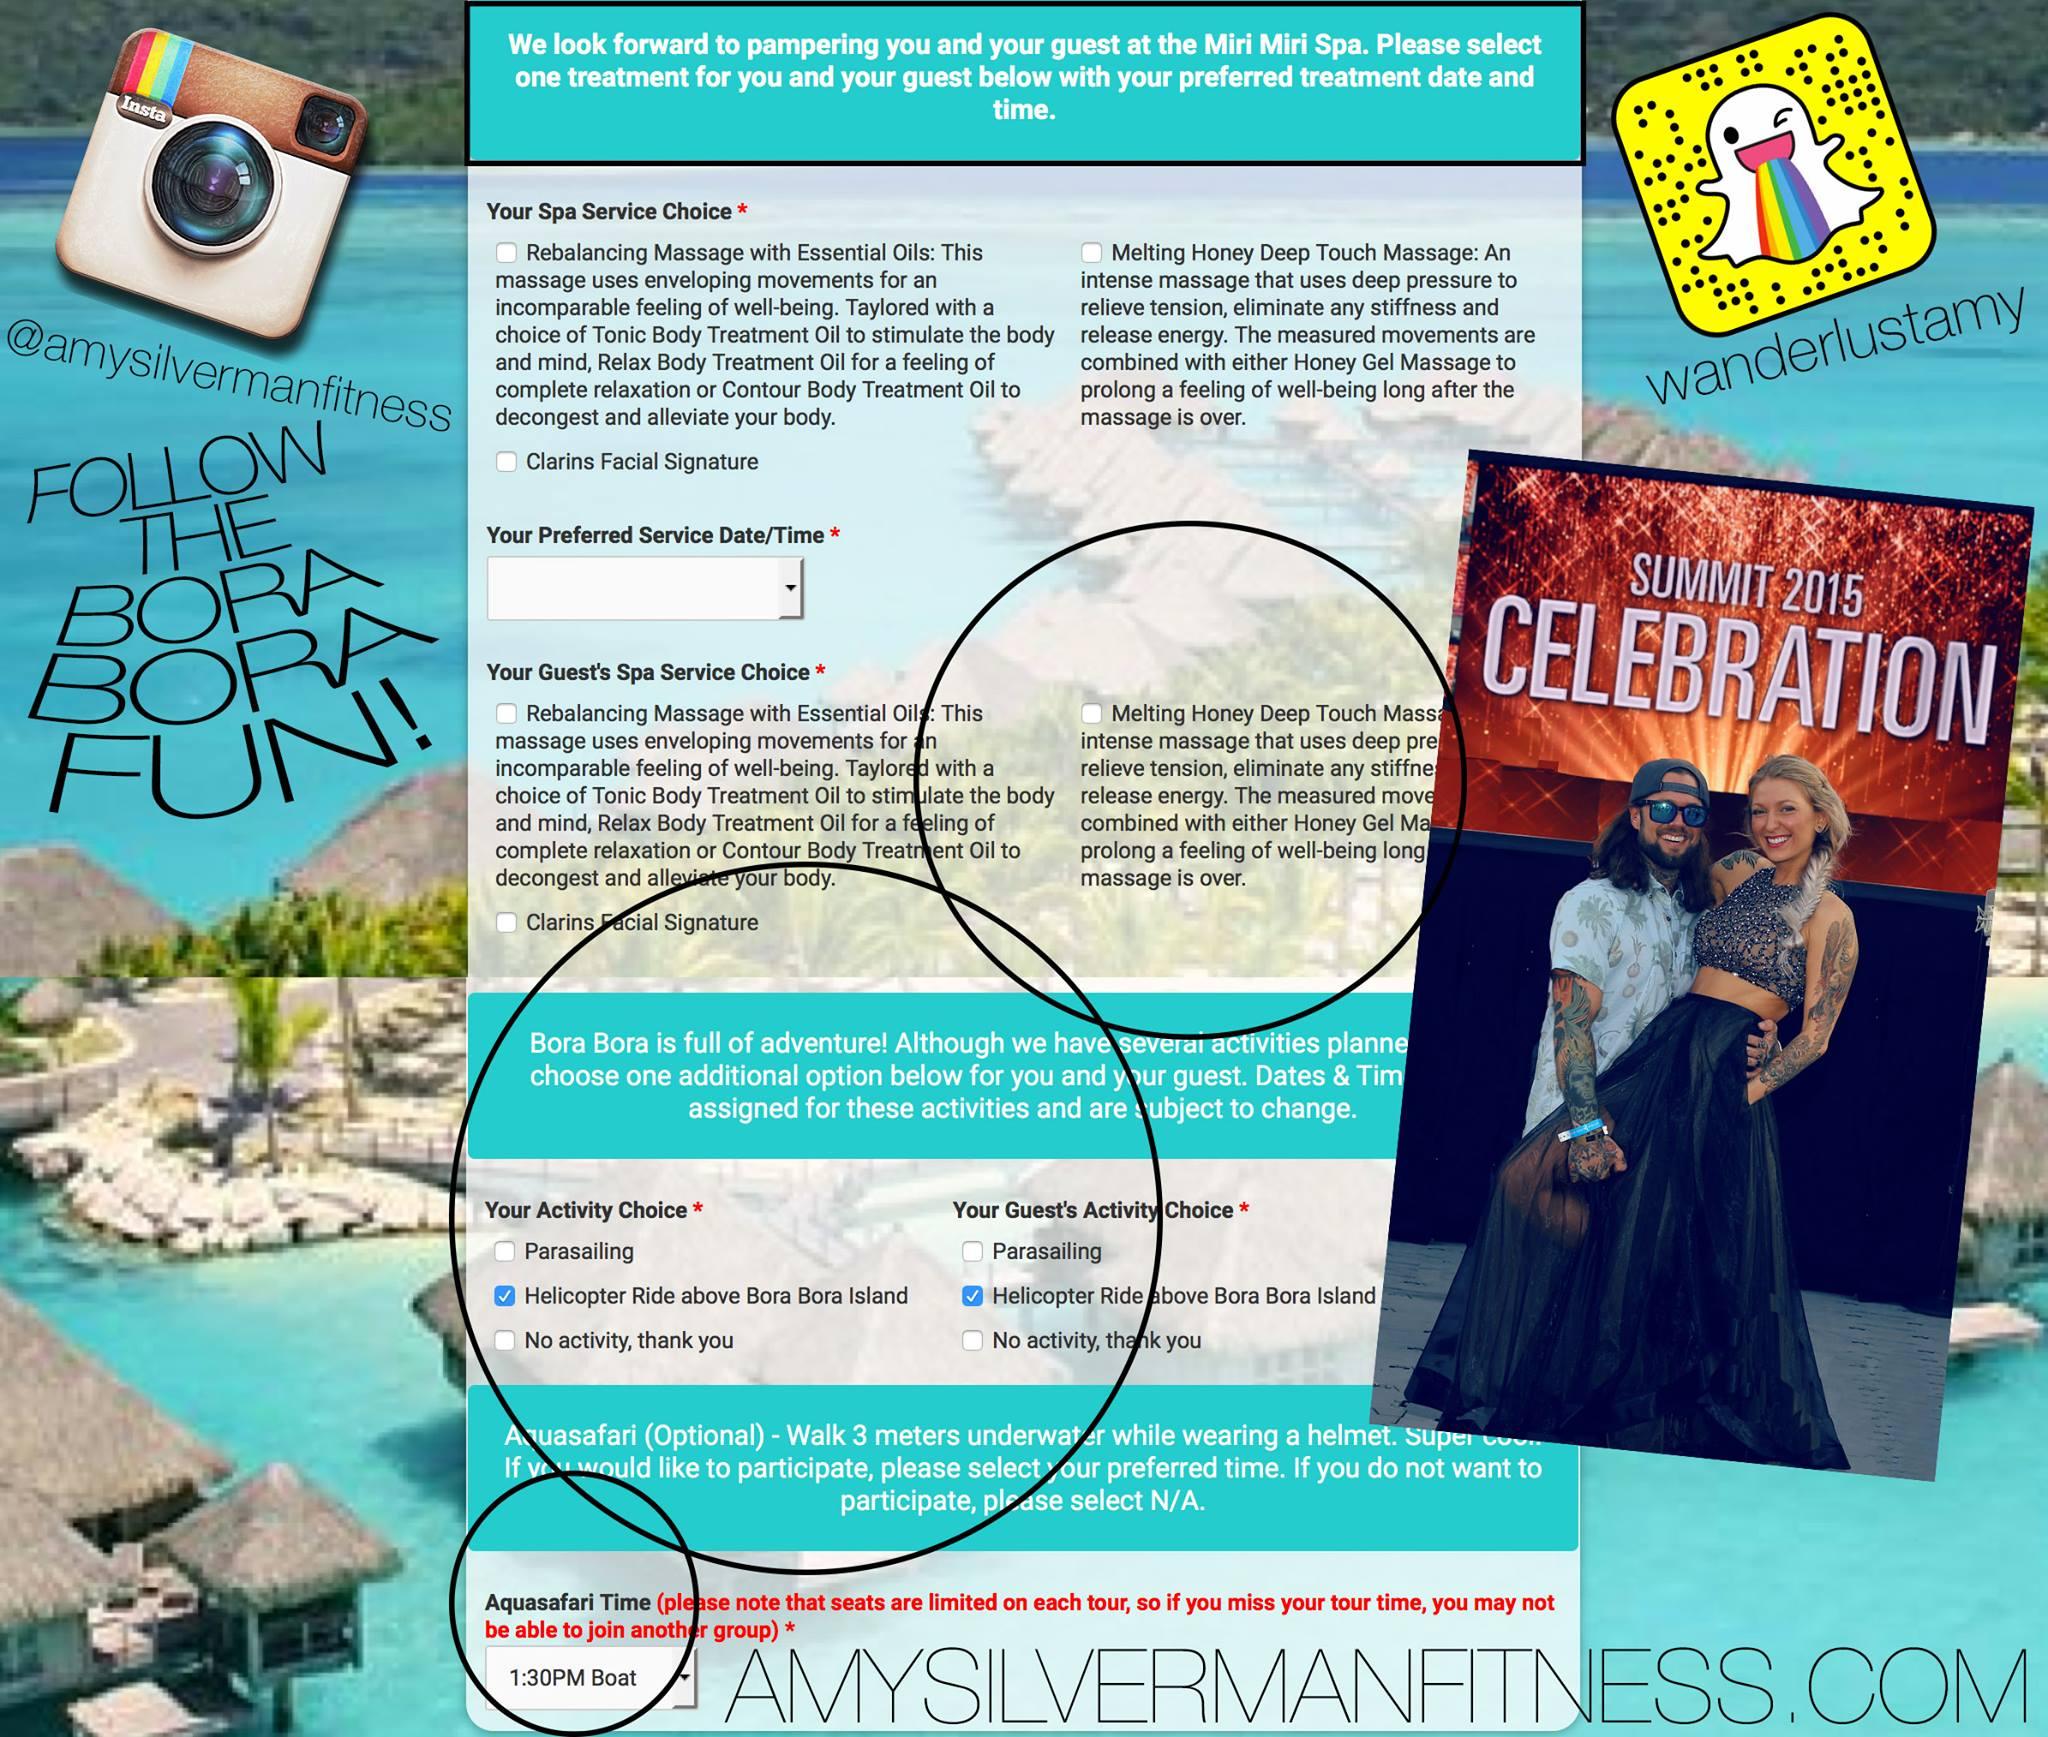 Beachbody Bora Bora Vacation! Follow our adventure!